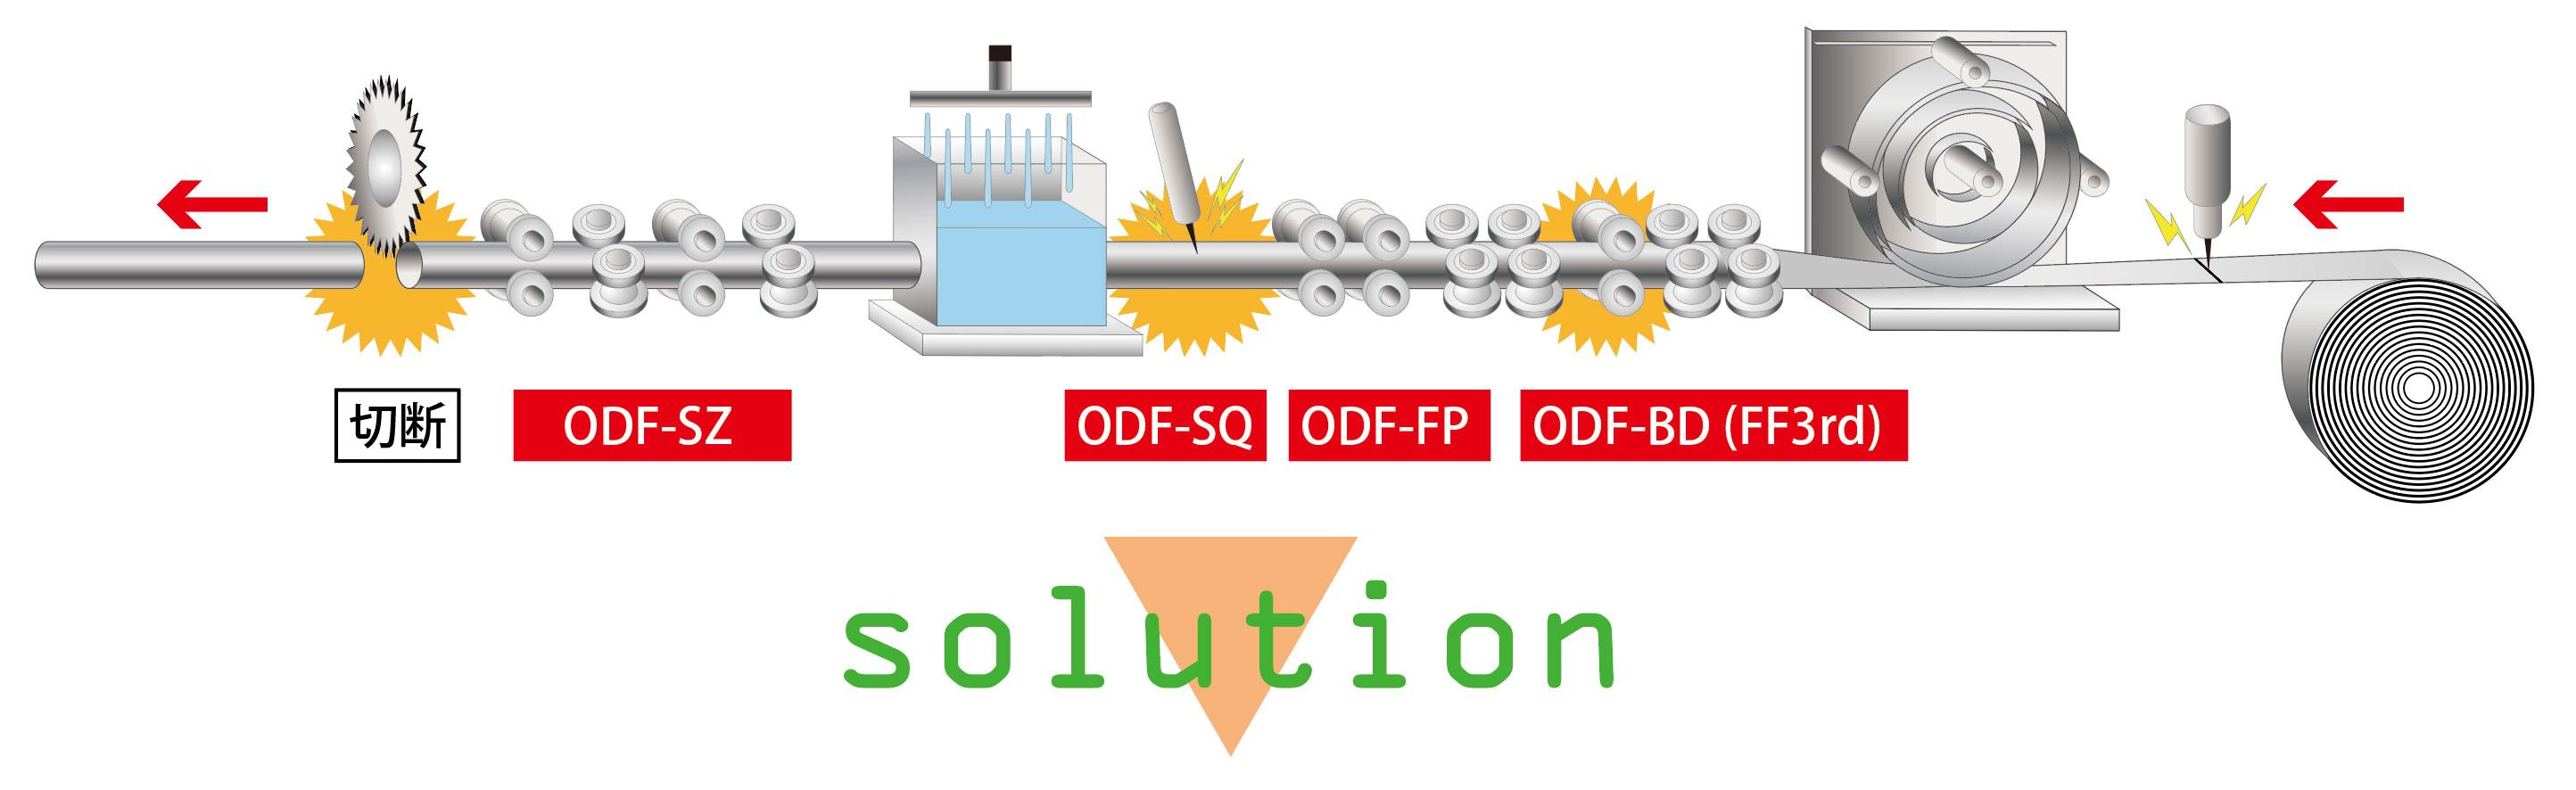 ODFの適用